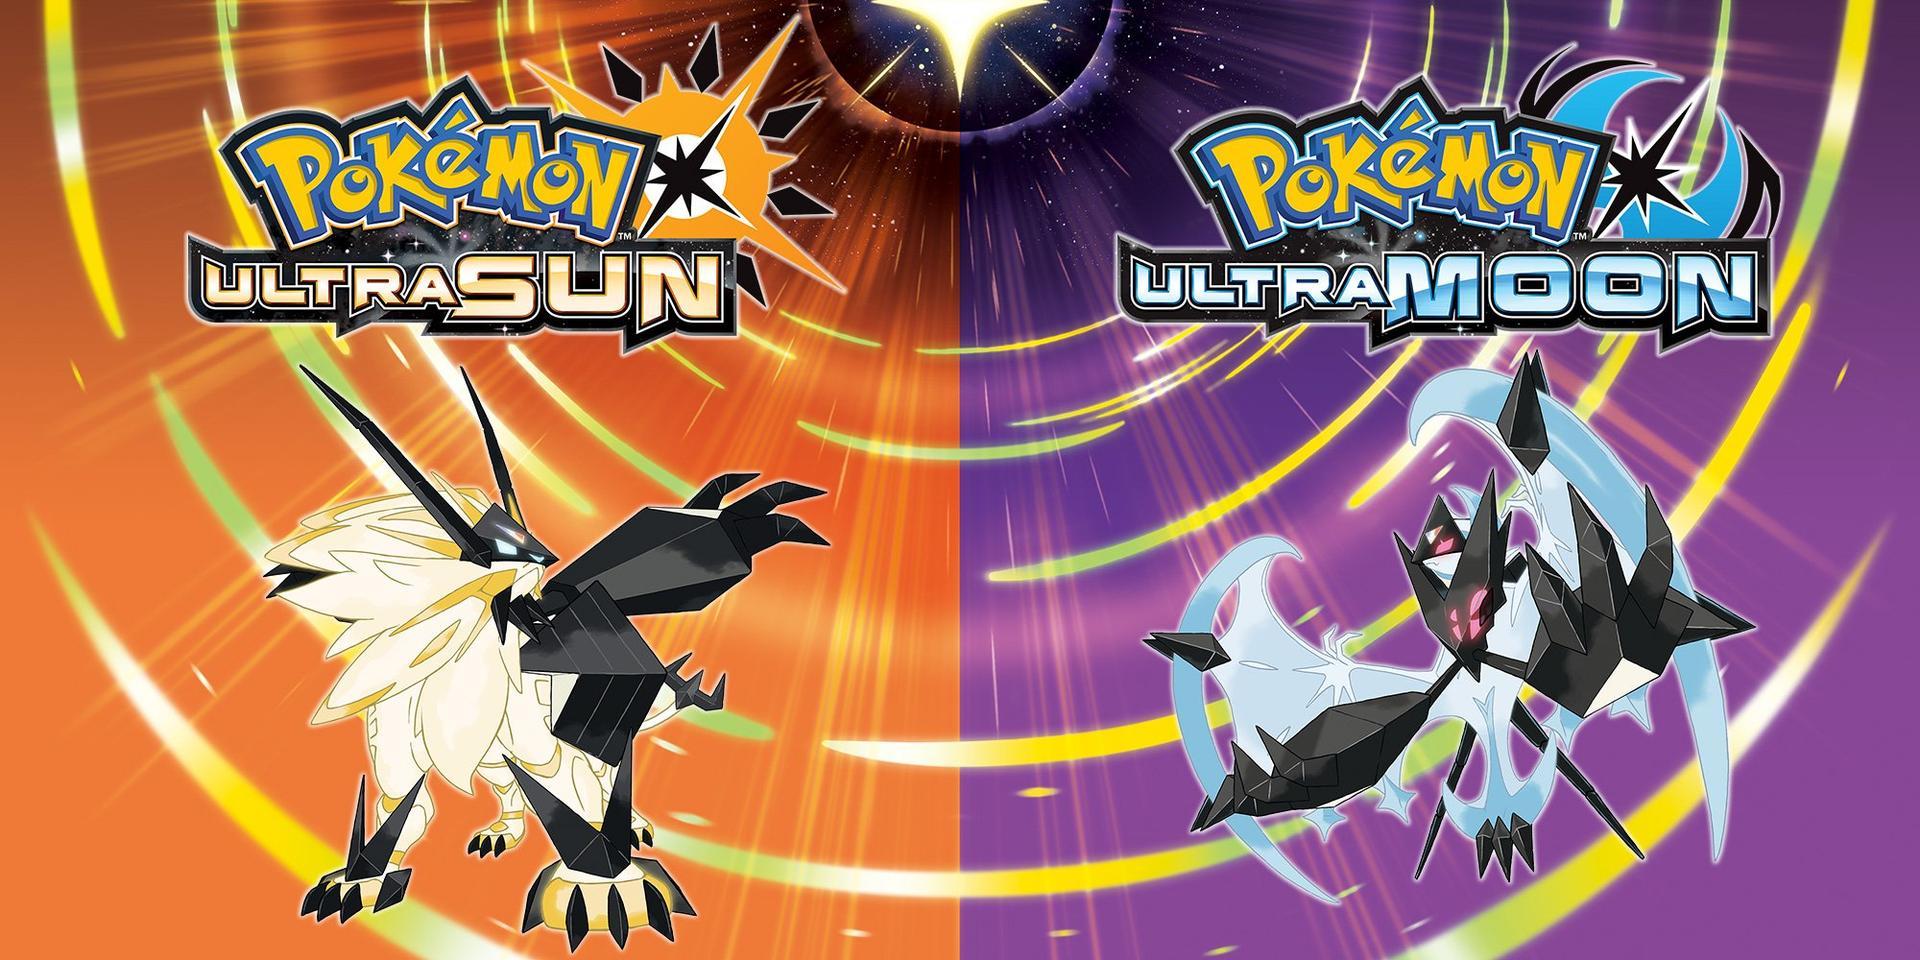 Novo Trailer de Pokémon Ultra Sun/Pokémon Ultra Moon revela novas Ultra Beasts e mais novidades